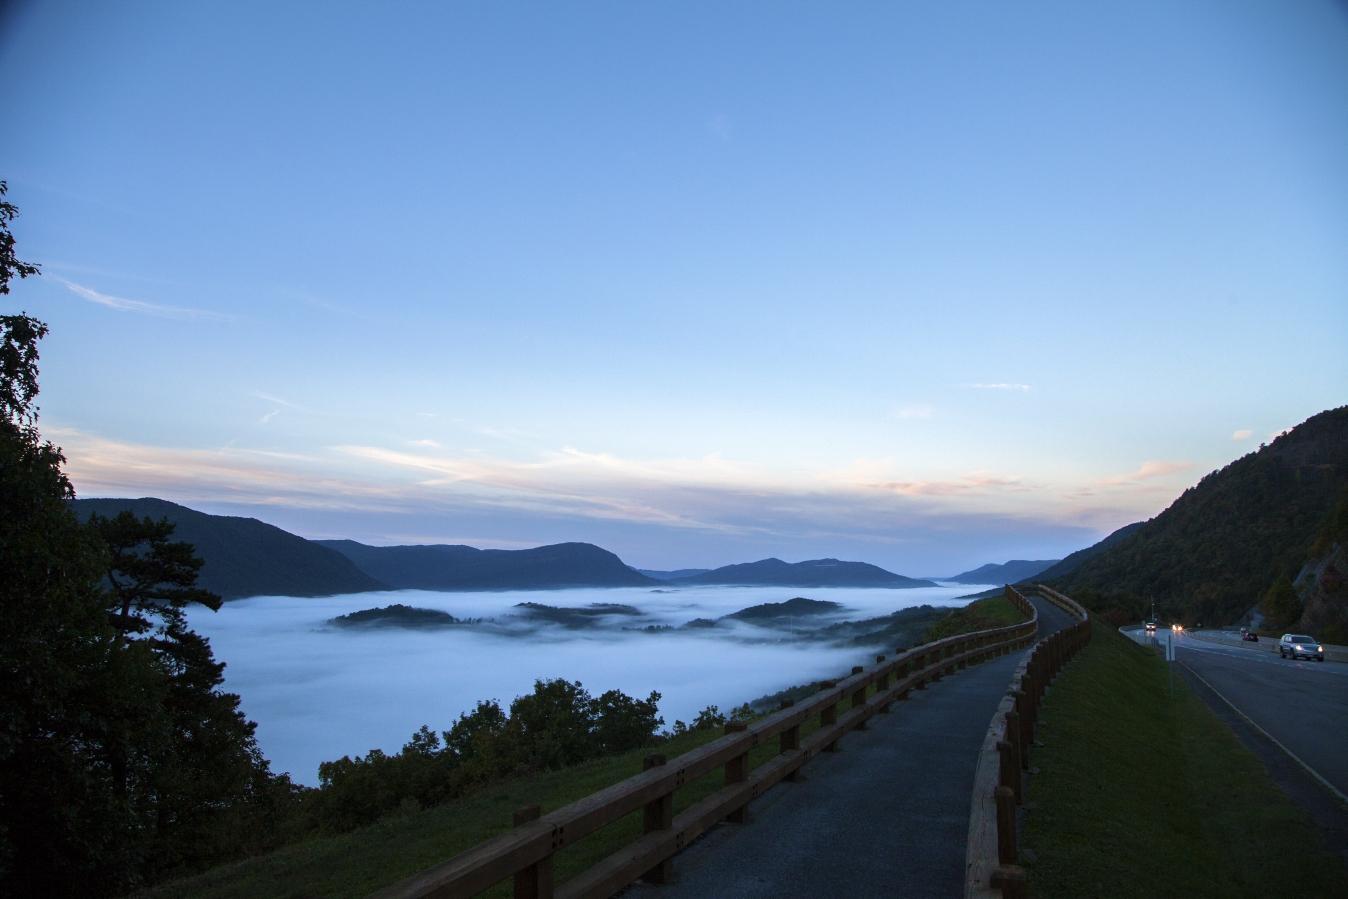 Scenic Overlook in Wise